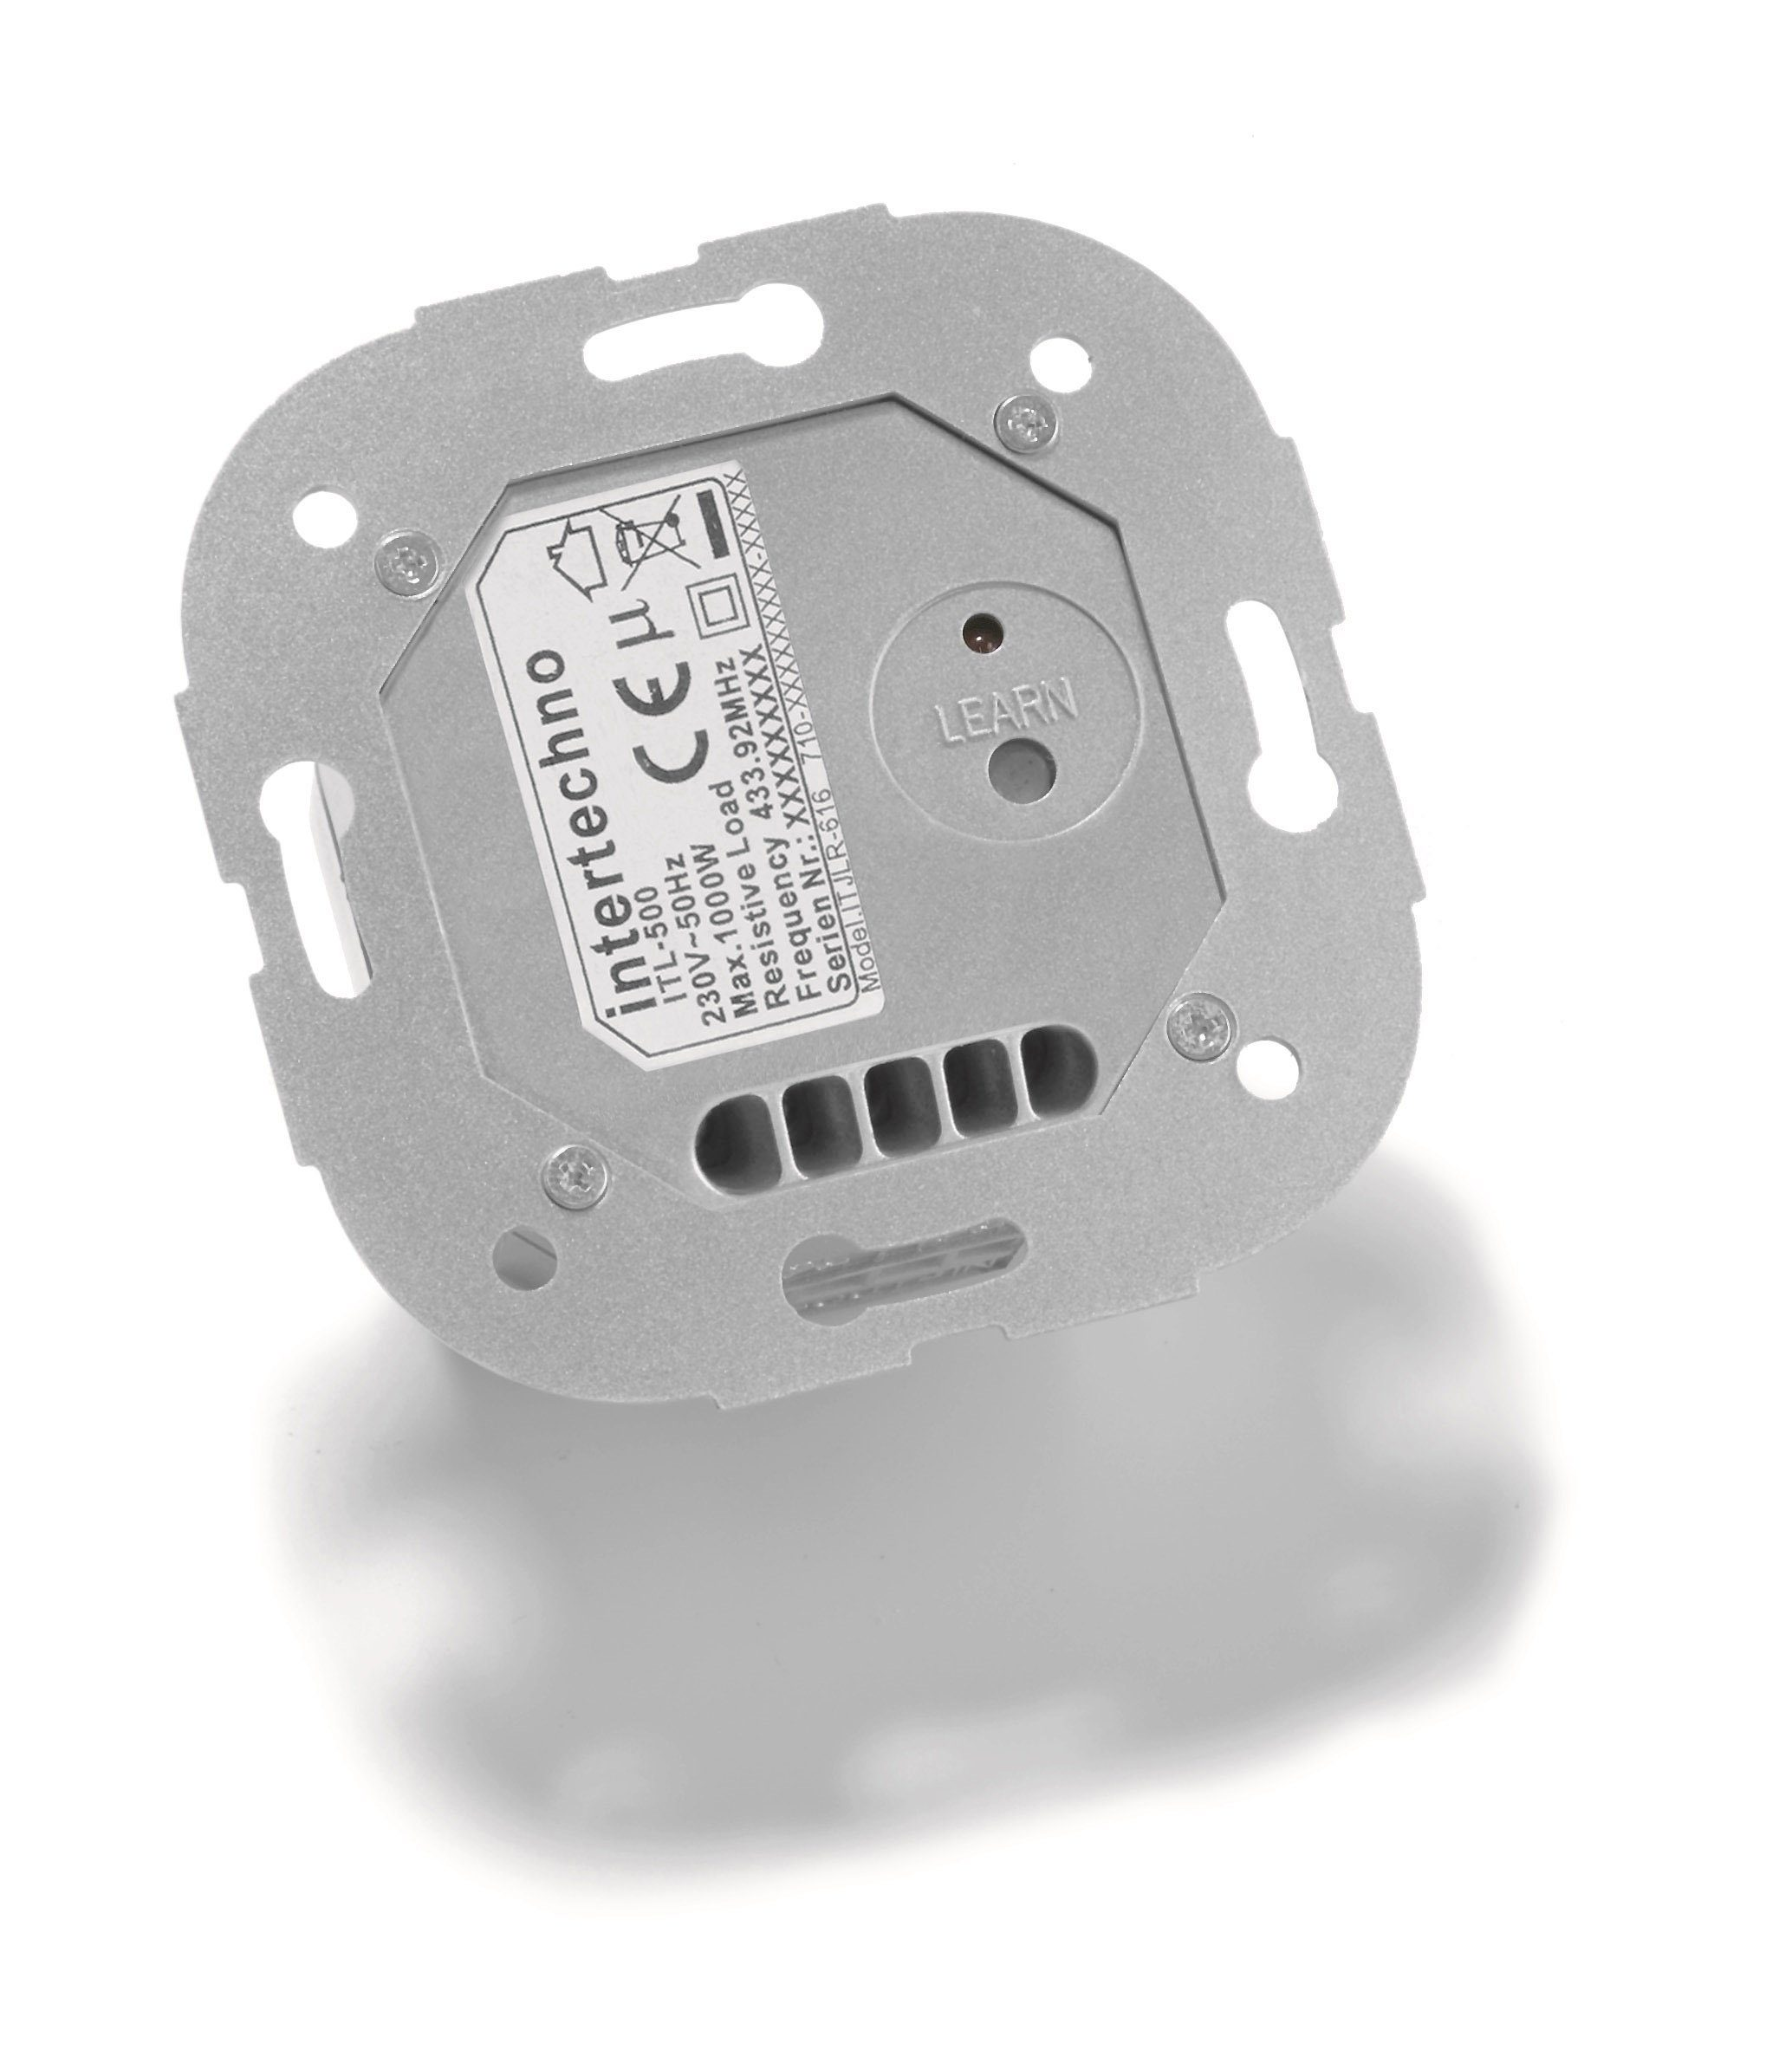 intertechno - Smart Home - Steuerung & Komfort »ITL-500 Funk- Jalousieschalter«